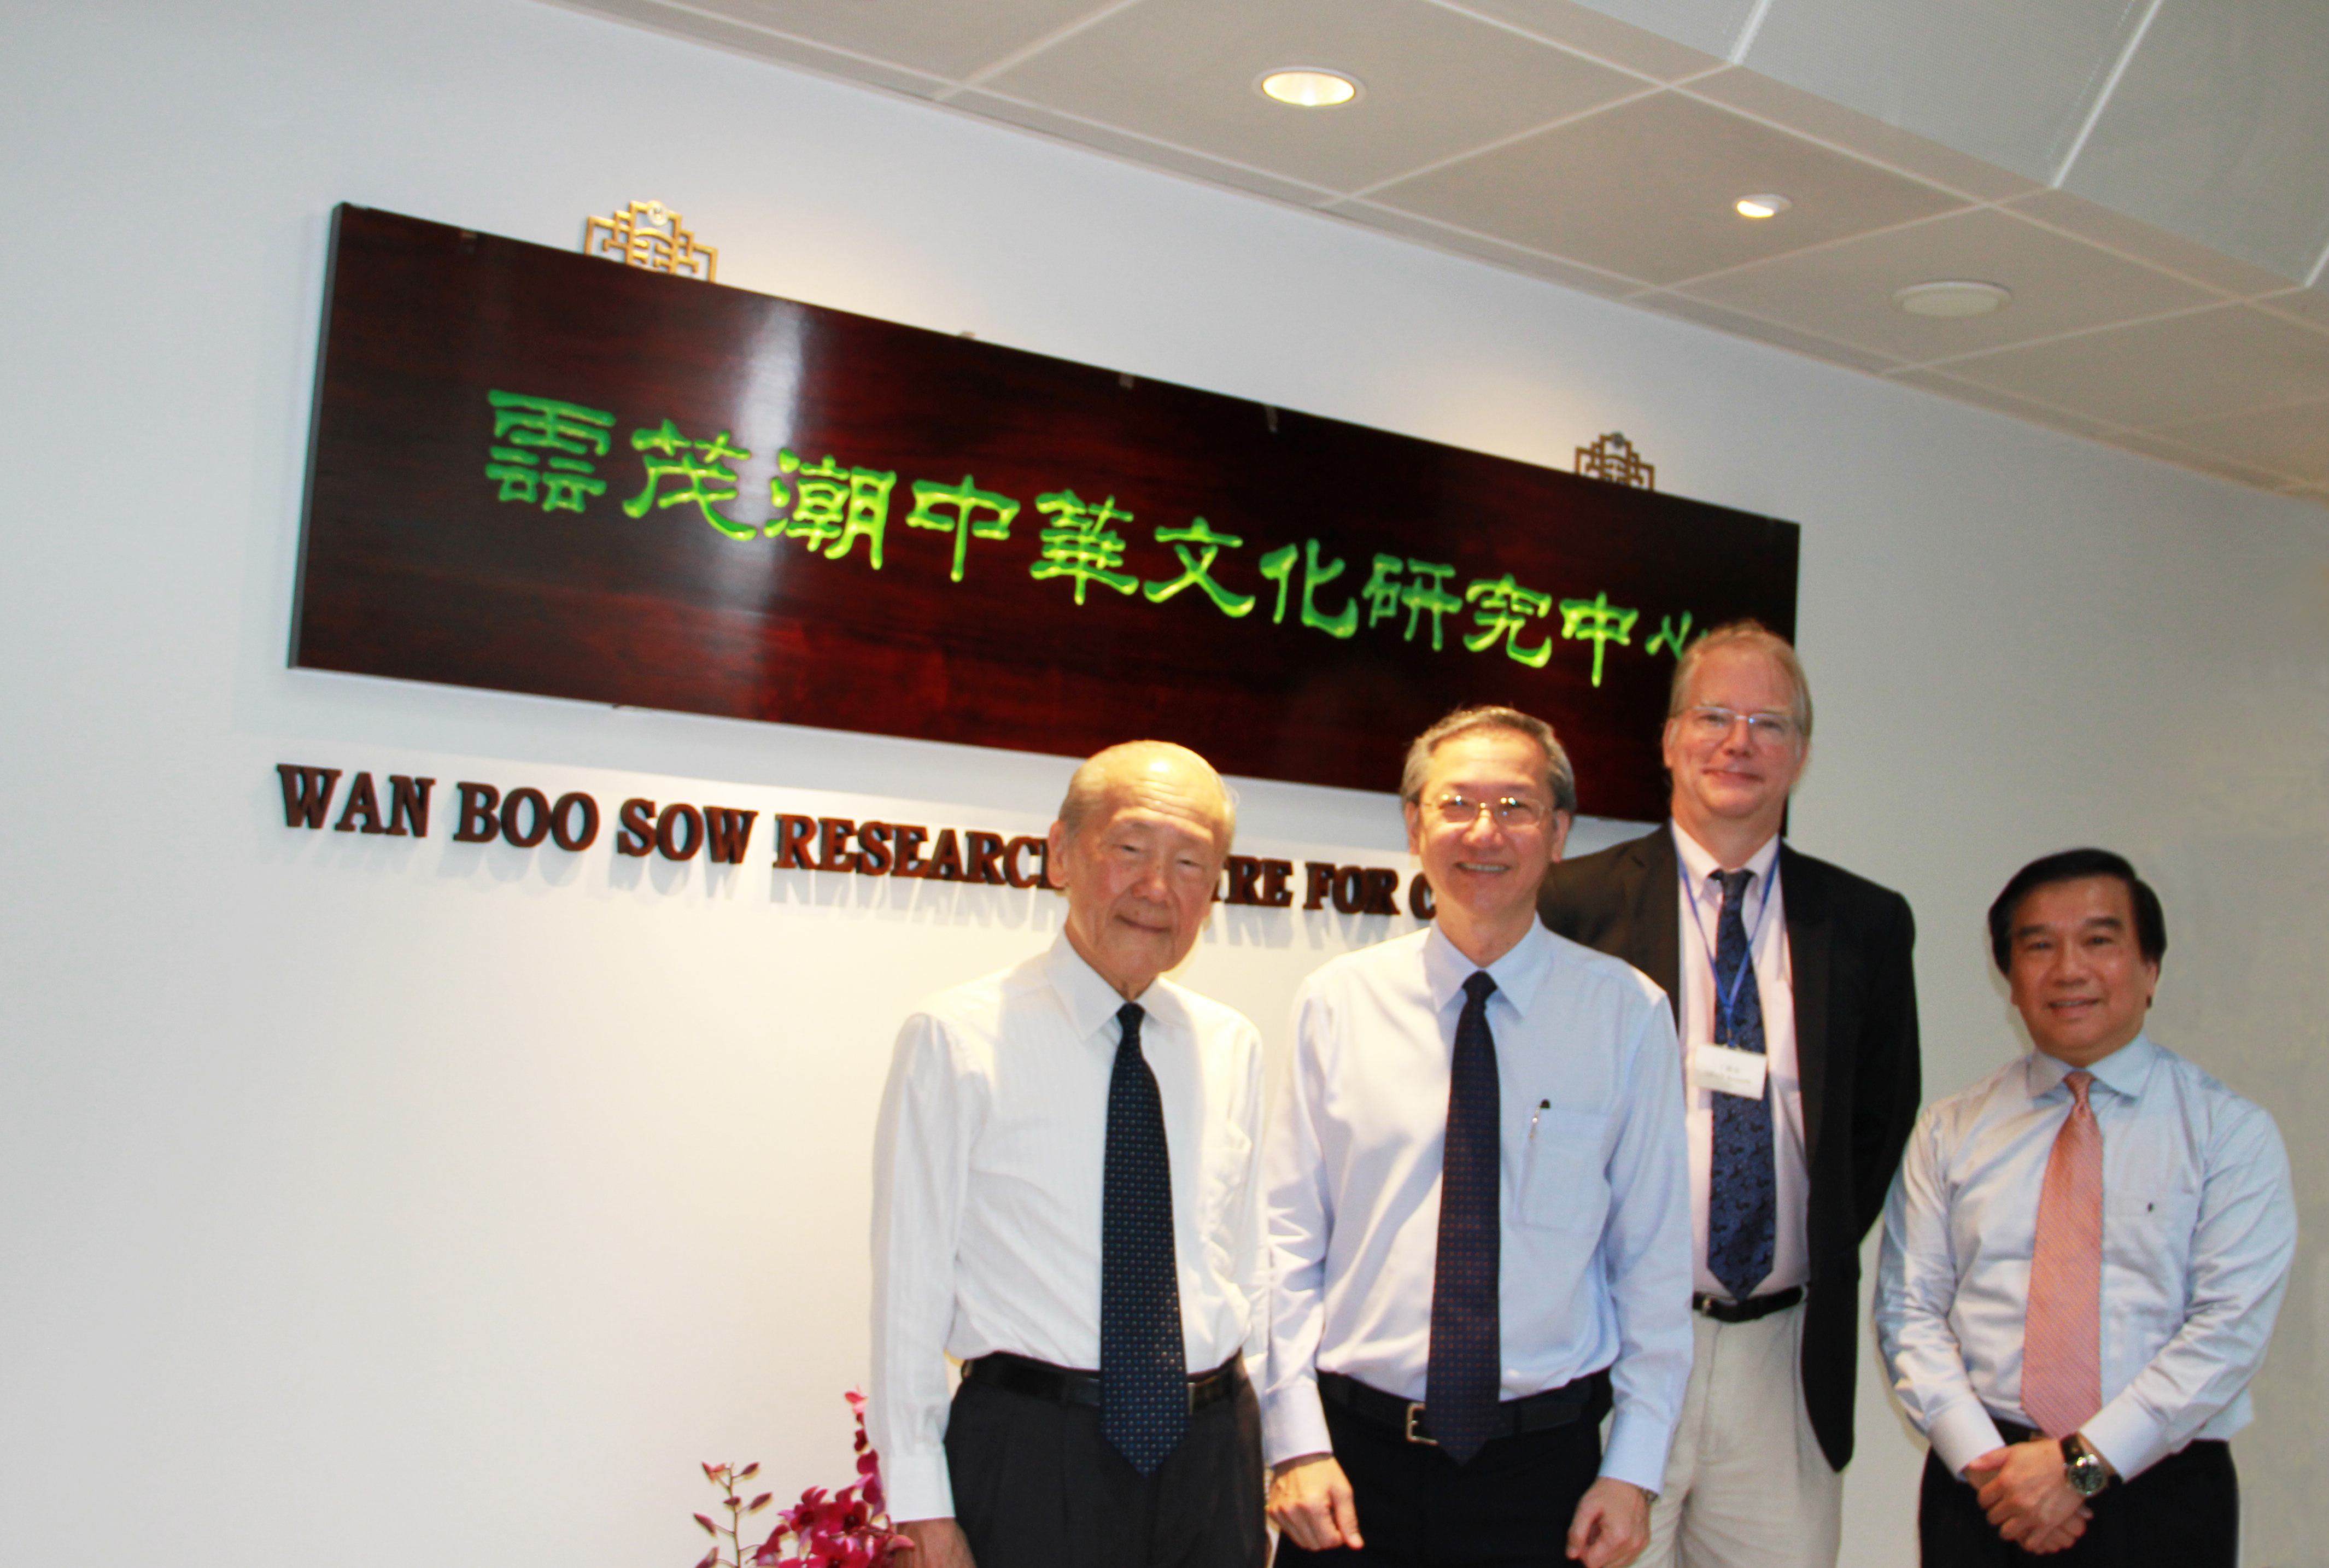 Prof Wang Gungwu, Mr Sam Tan, Prof Kenneth Dean, and A/P Lee Cheuk Yin